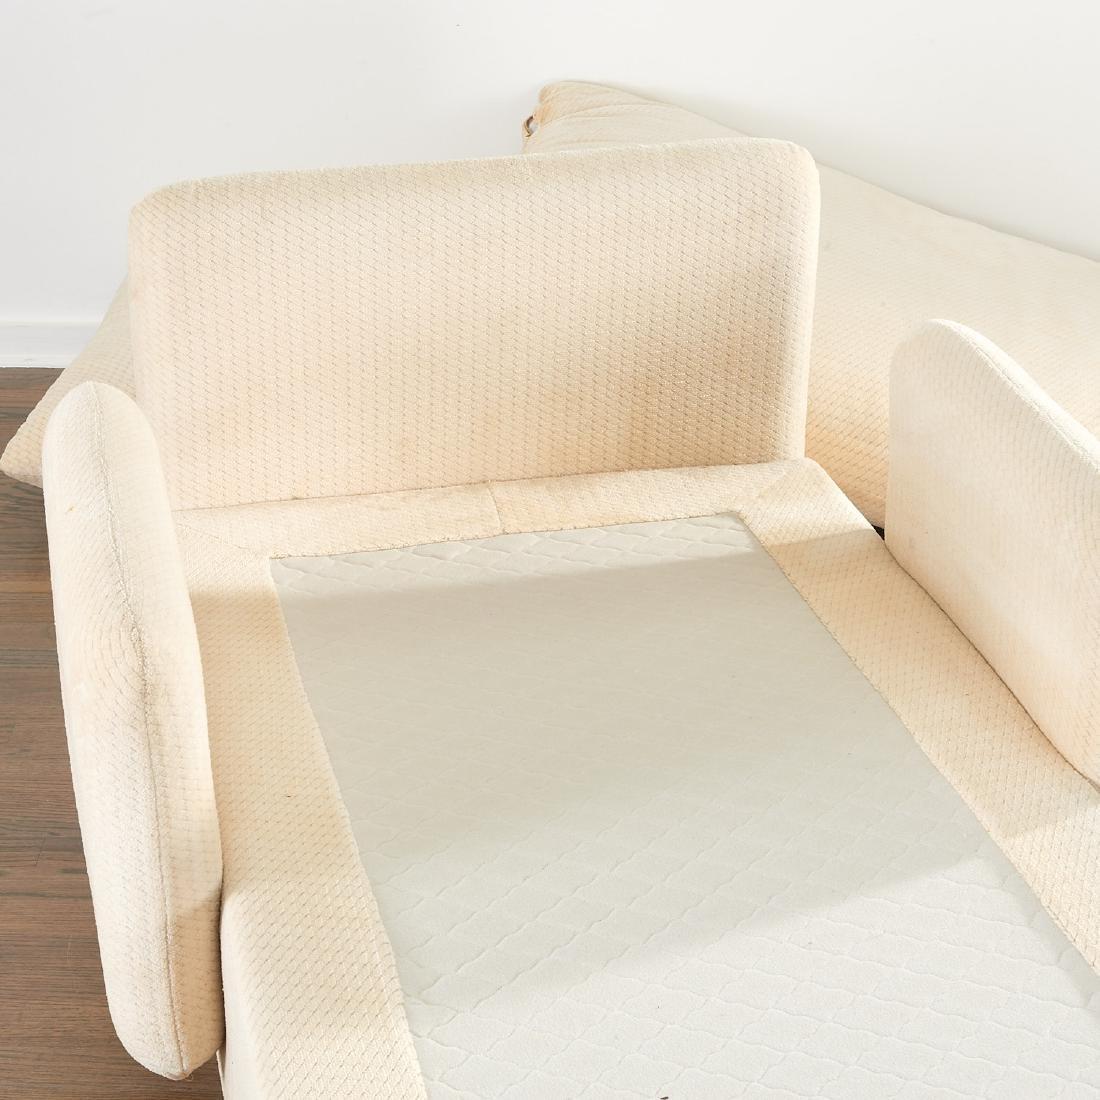 Gae Aulenti upholstered chaise longue - 3